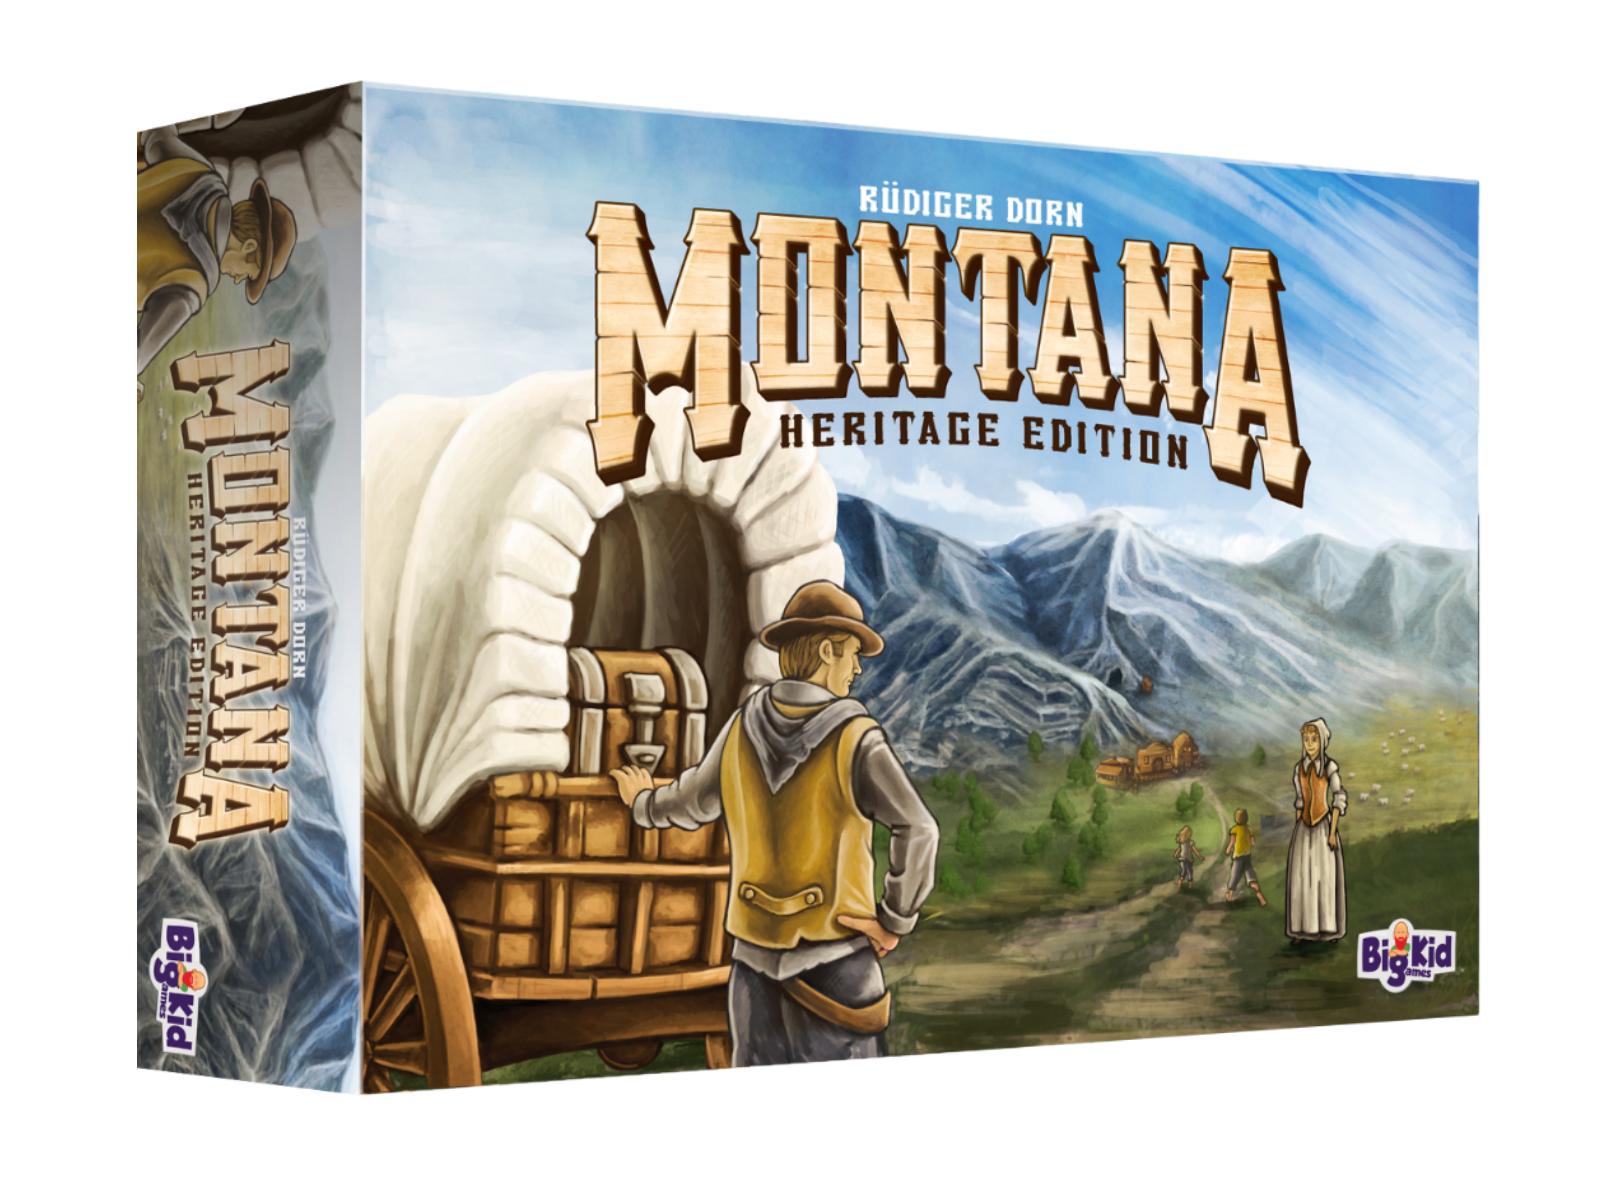 3d Montana box site.png